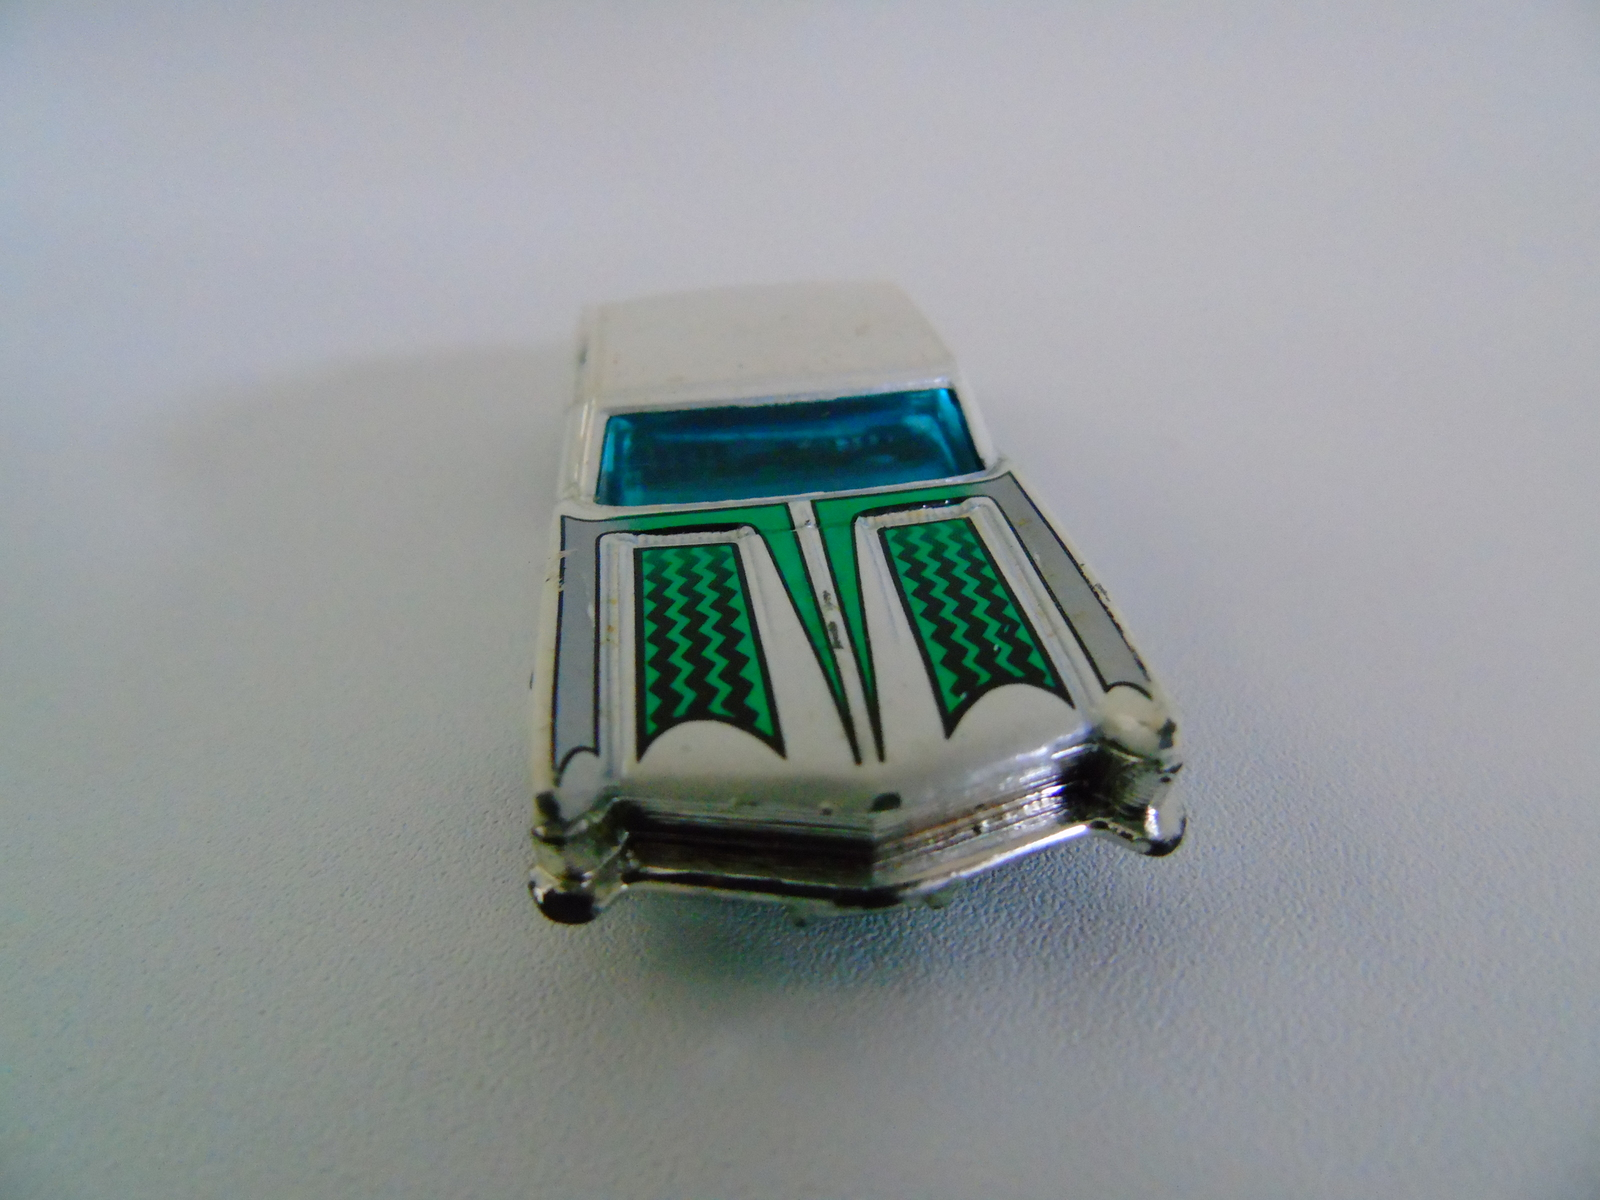 2001 Mattel Hot Wheels 1964  Riviera Toy Car